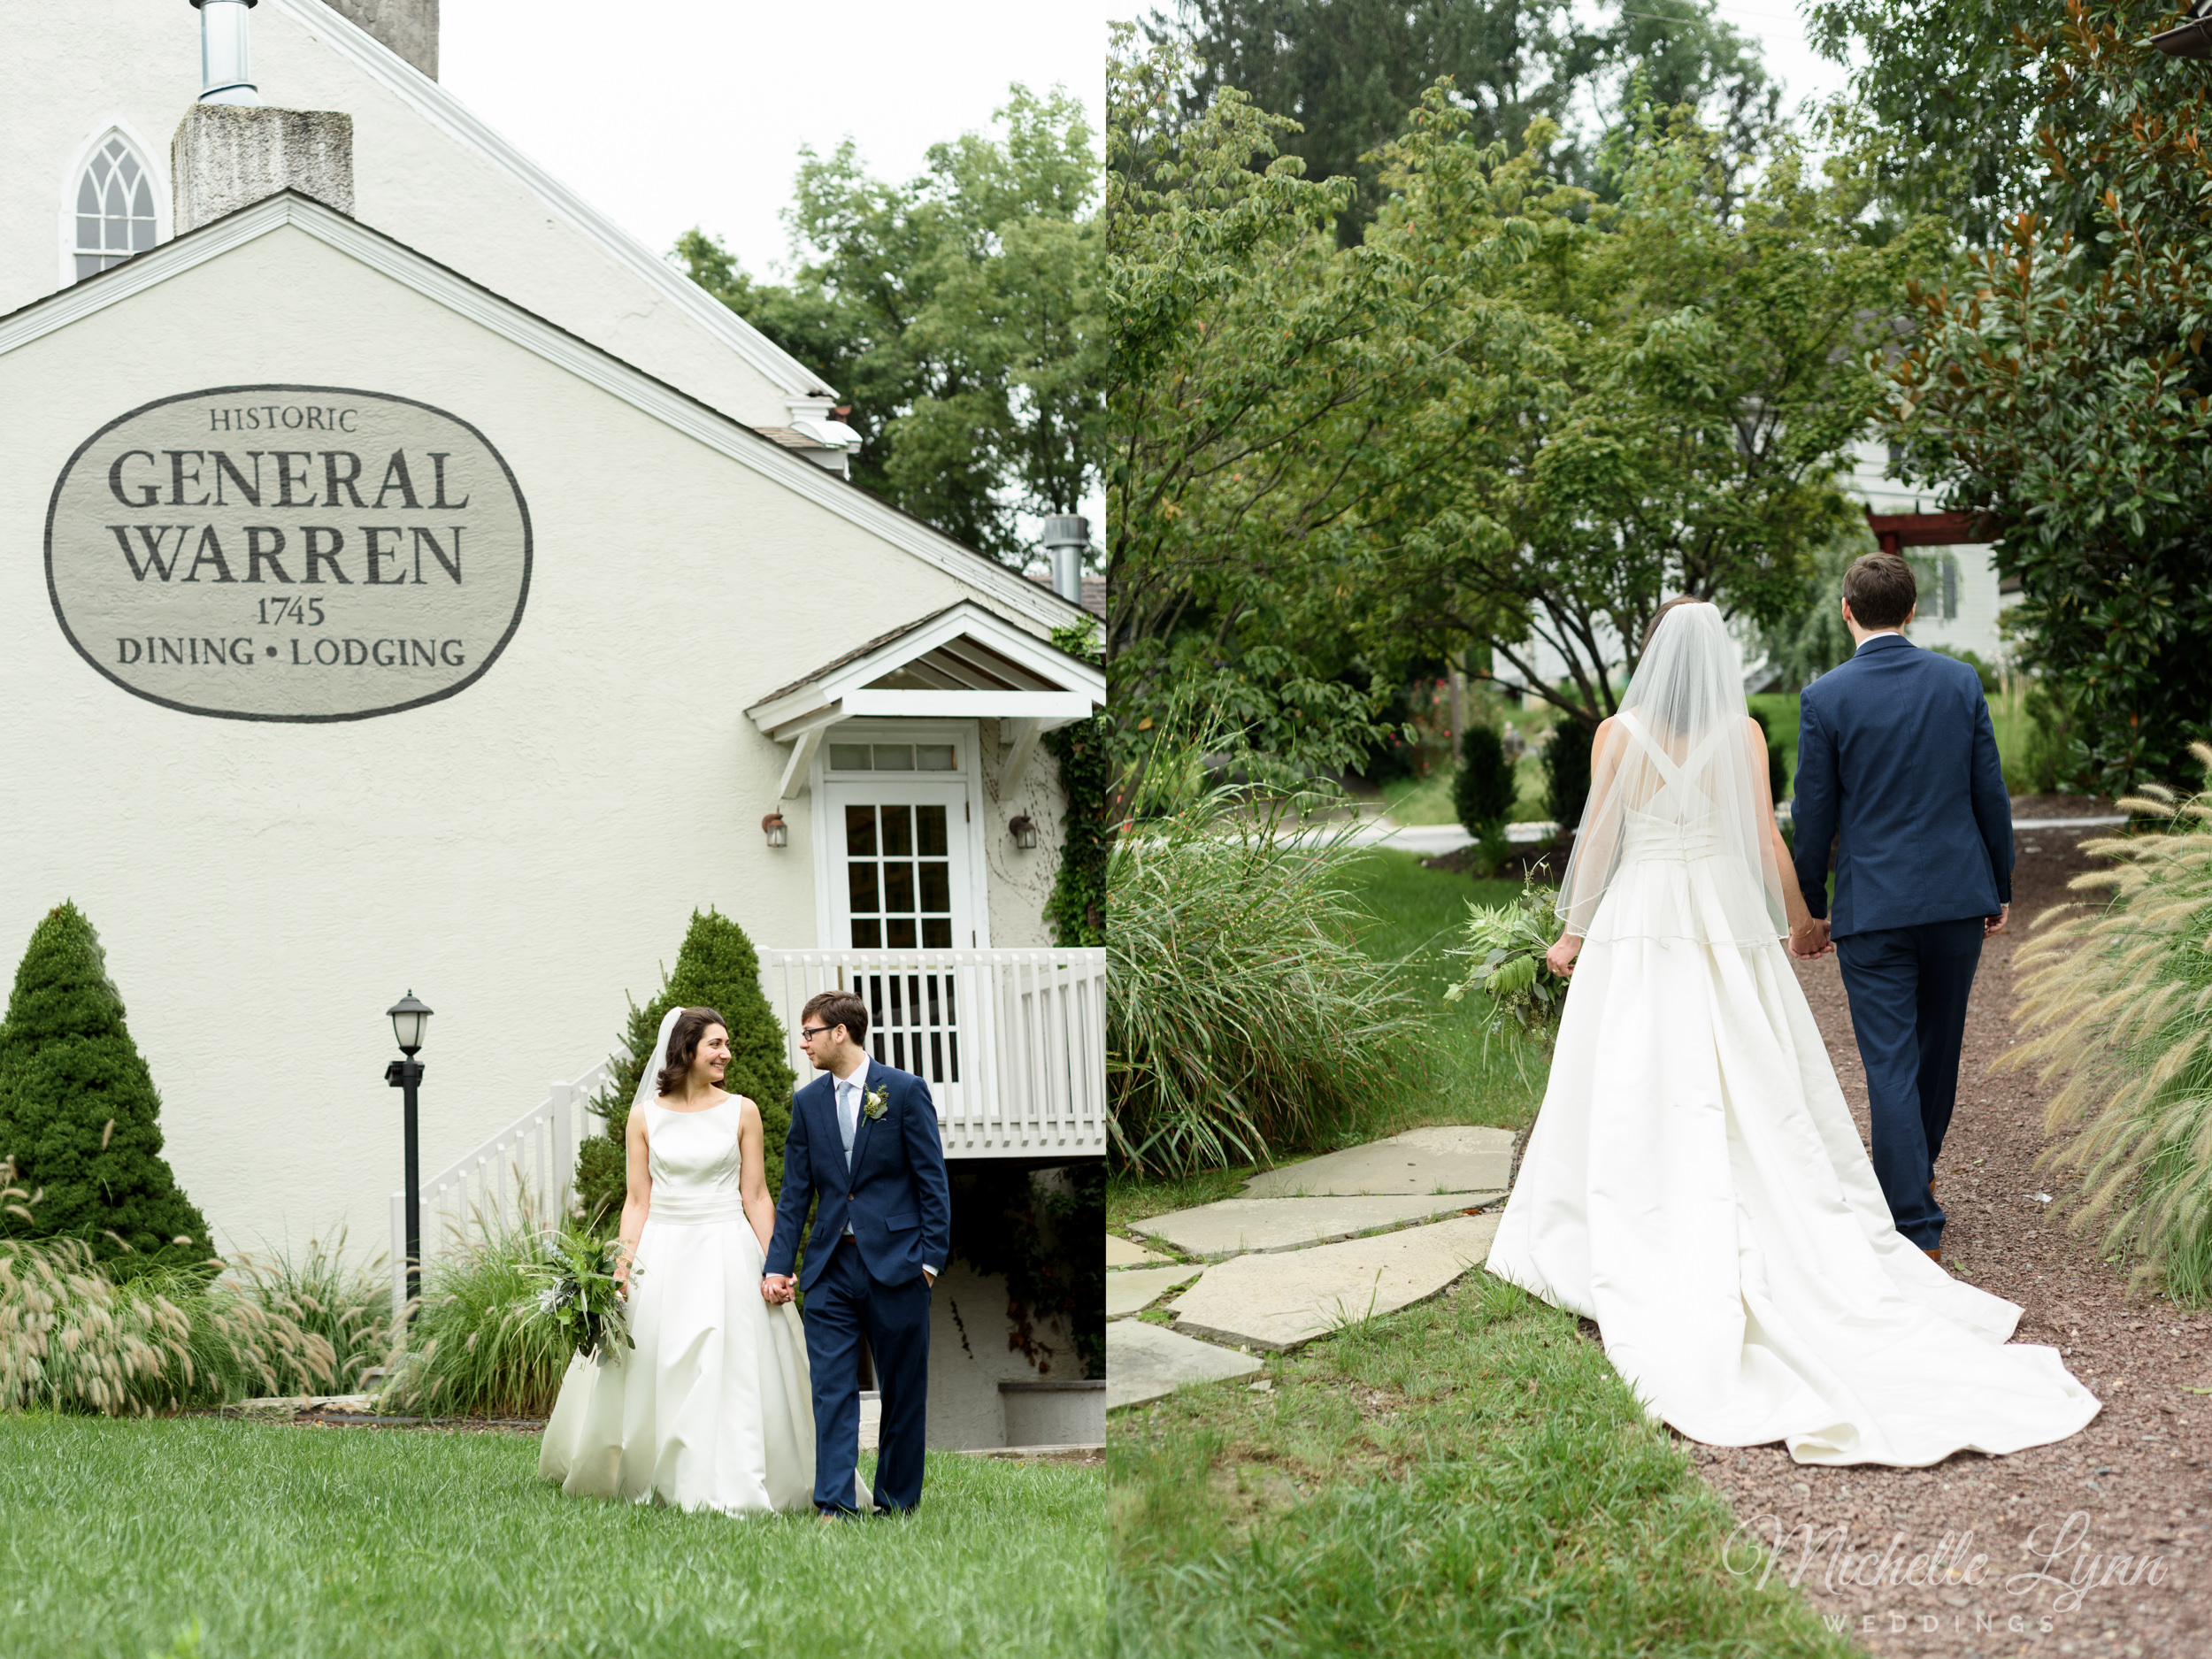 mlw-general-warren-malvern-wedding-photographer-36.jpg